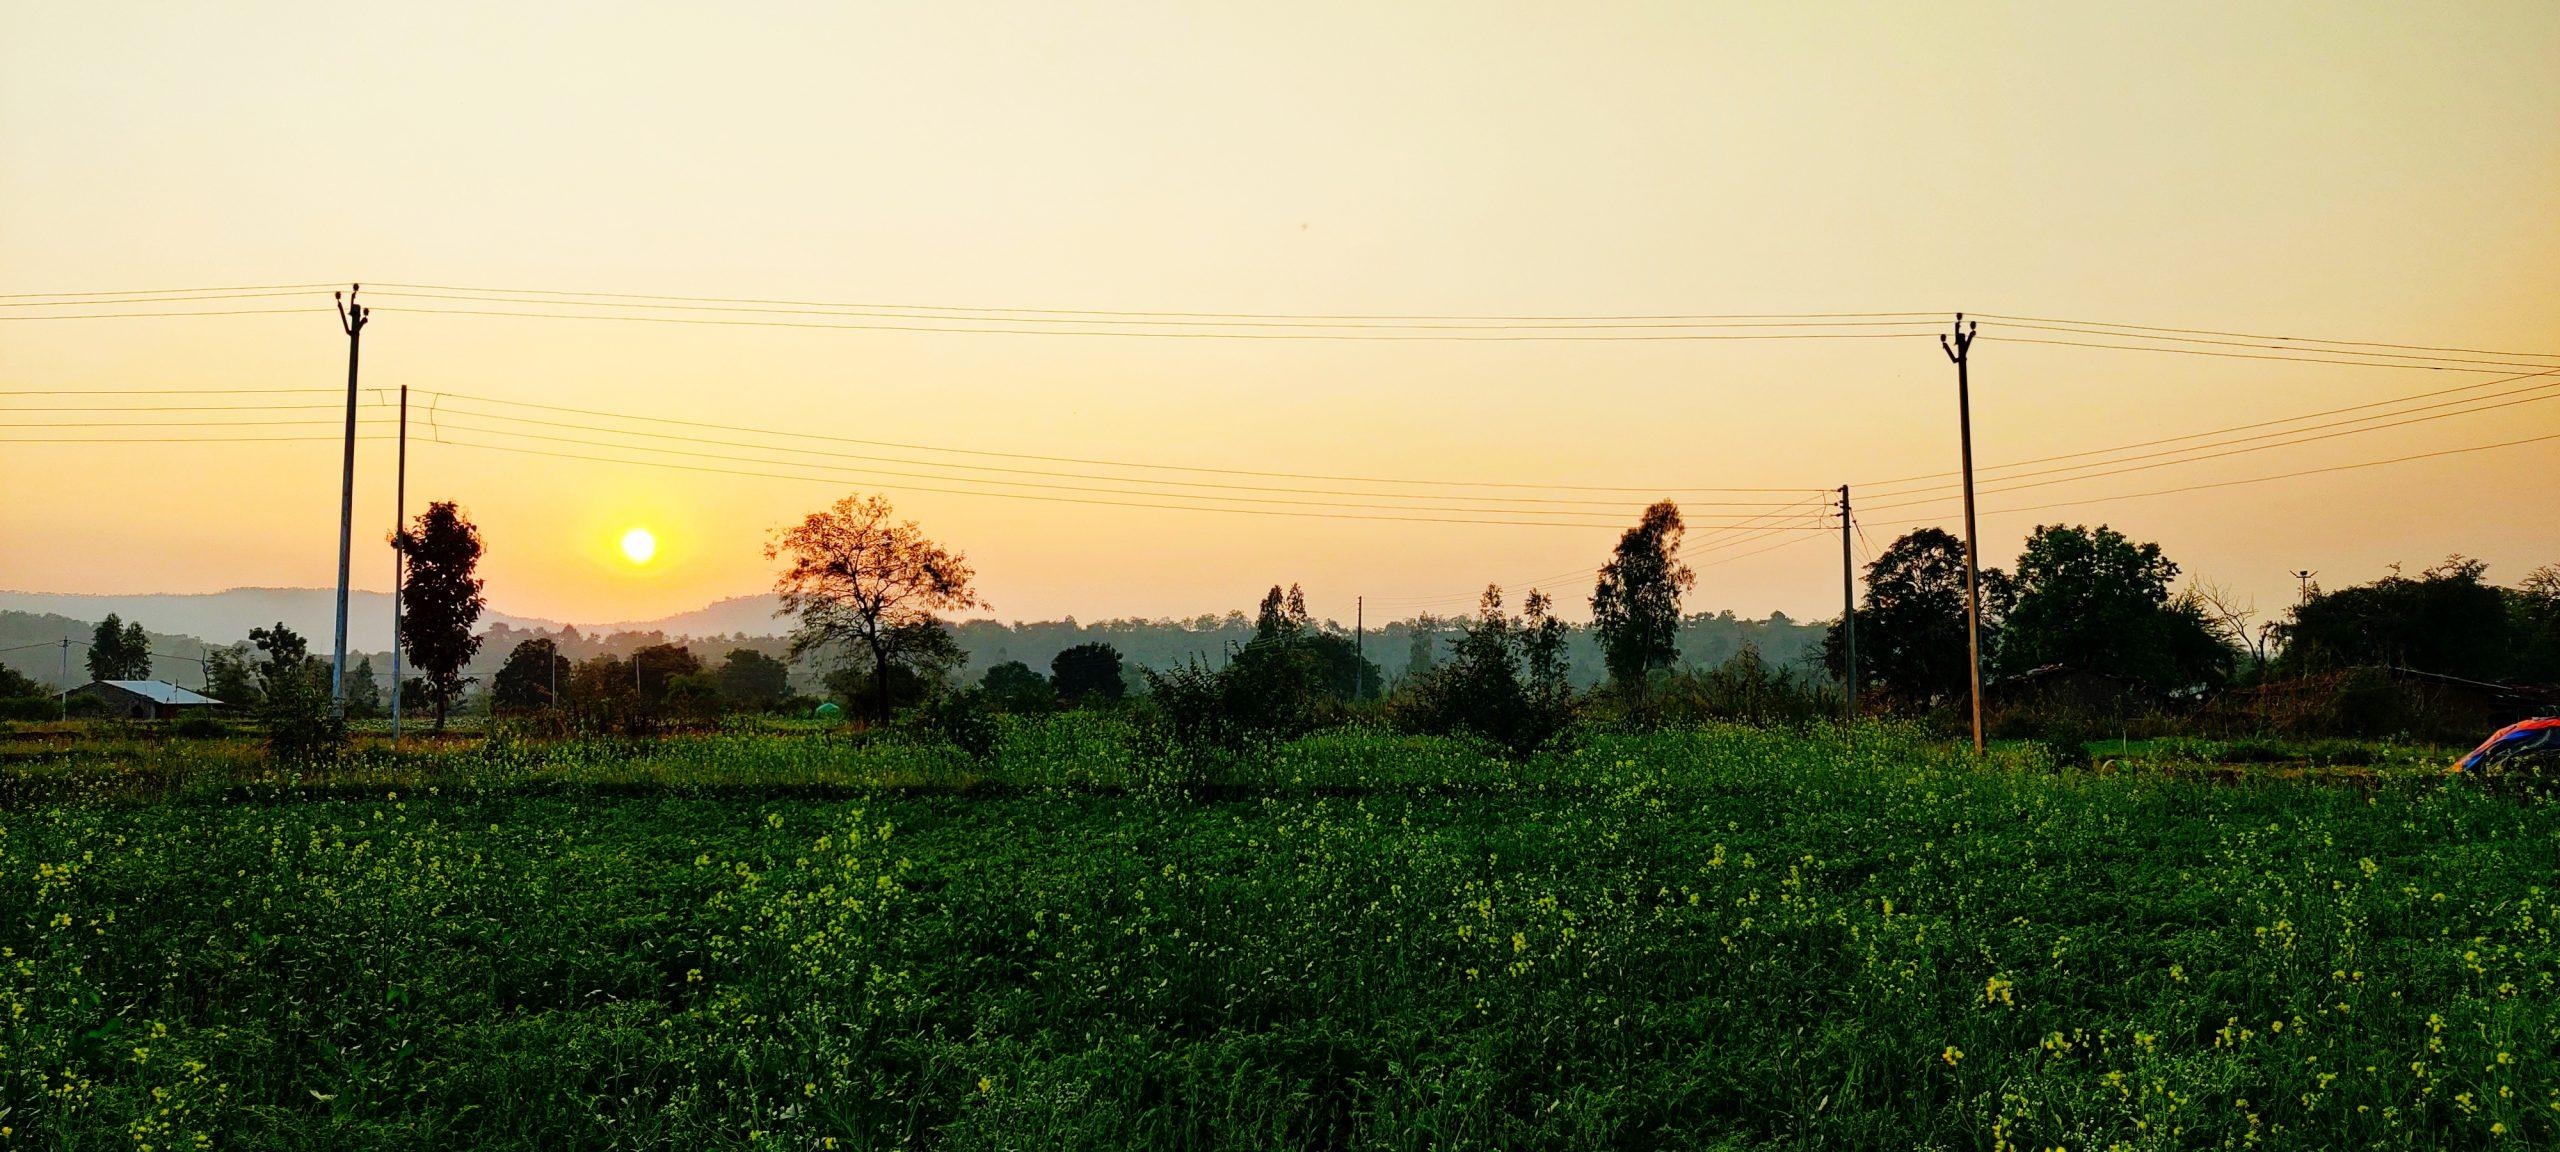 A sunset hour